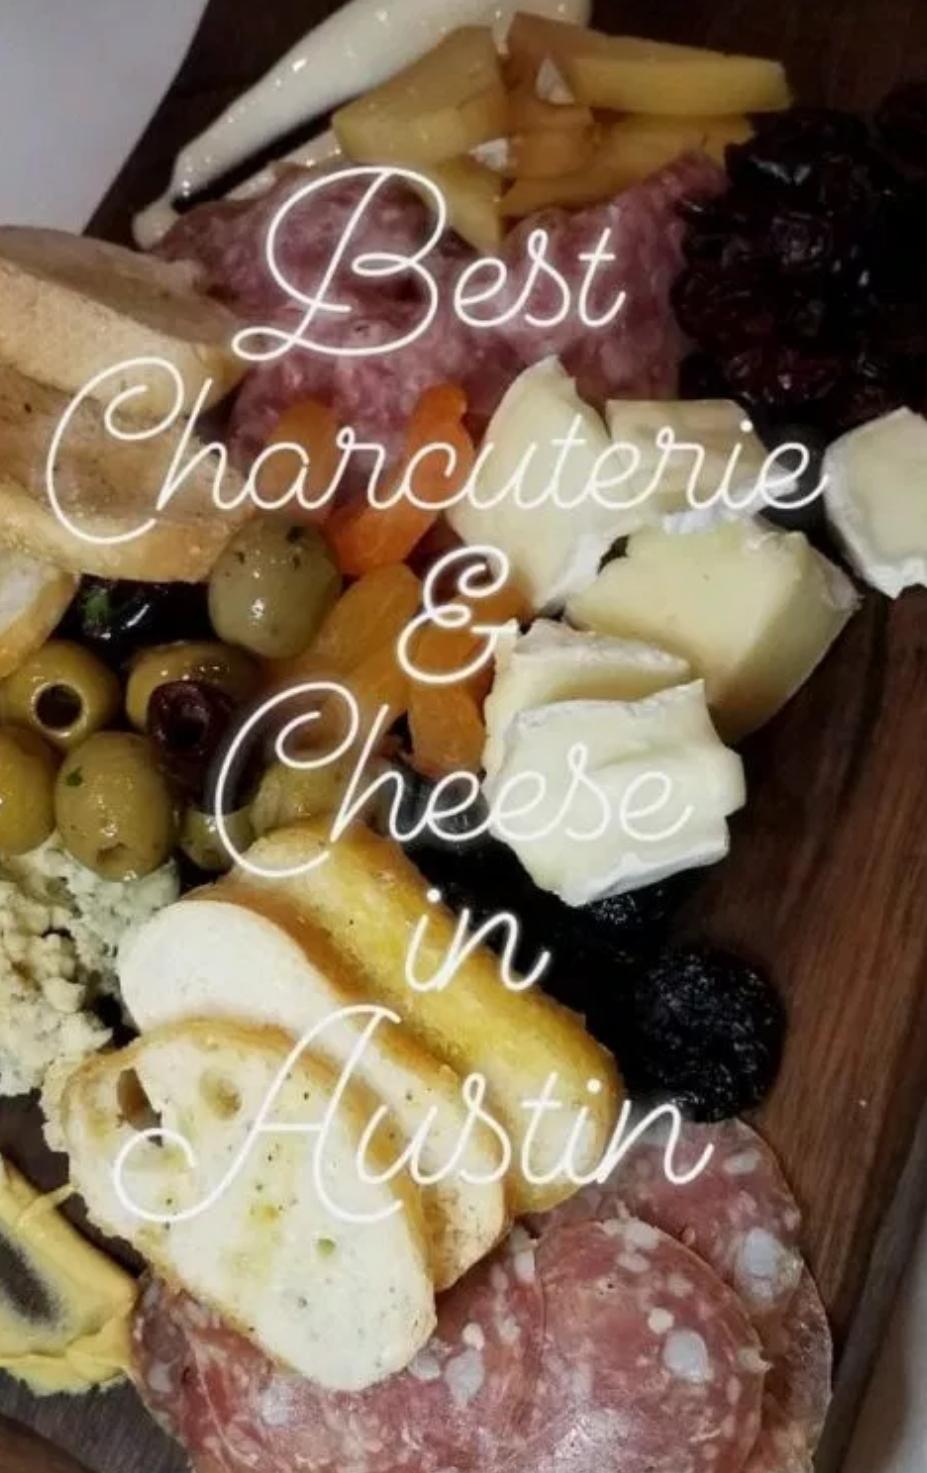 Charcuterie & Cheese: Austin's Best